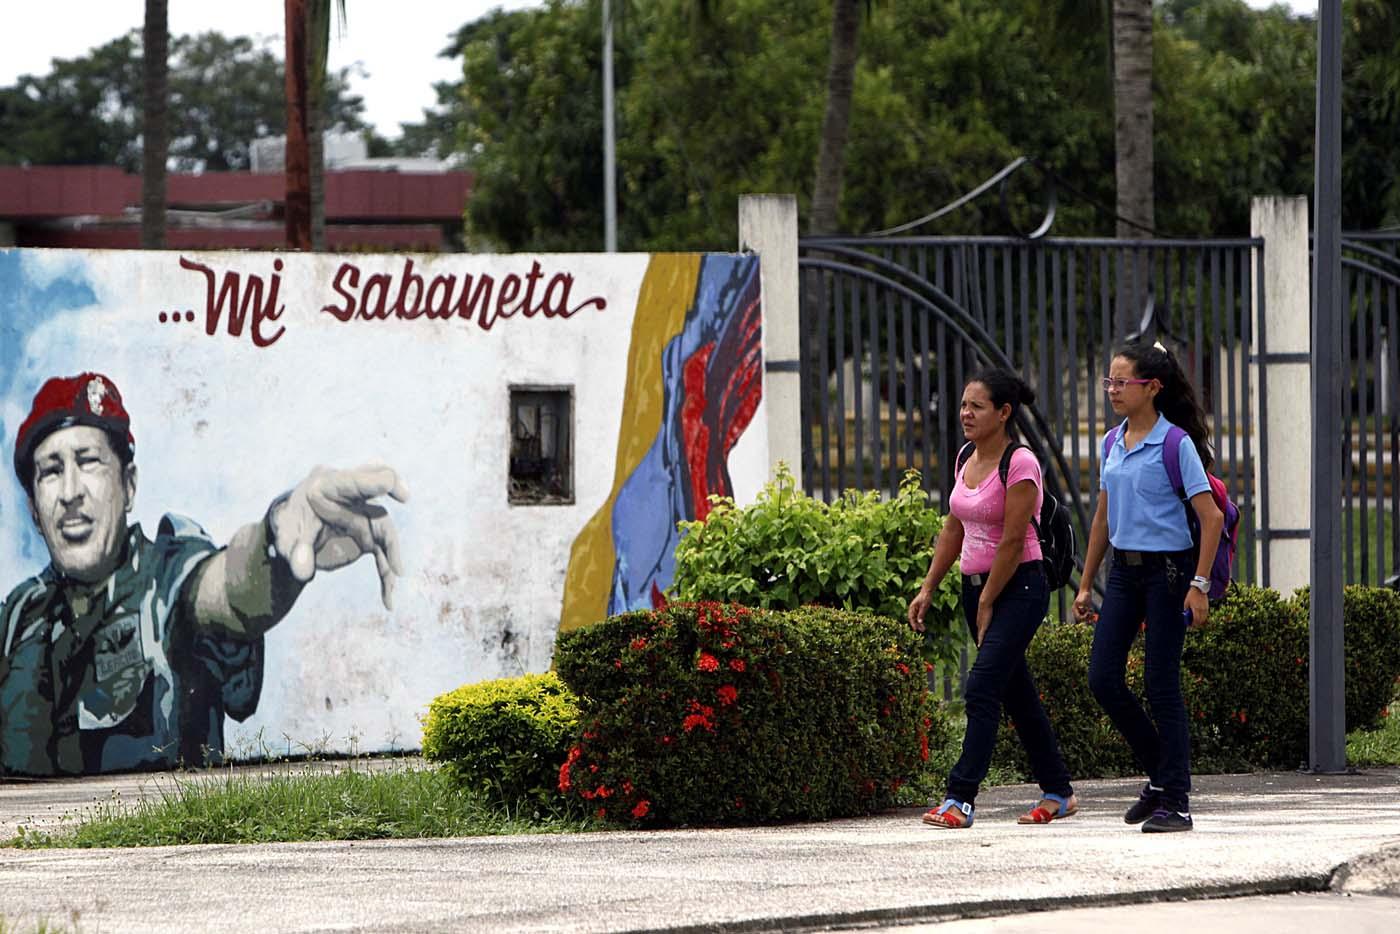 People walk past a mural depicting Venezuela's late President Hugo Chavez in Sabaneta, Venezuela June 13, 2017. Picture taken June 13, 2017. REUTERS/Carlos Eduardo Ramirez